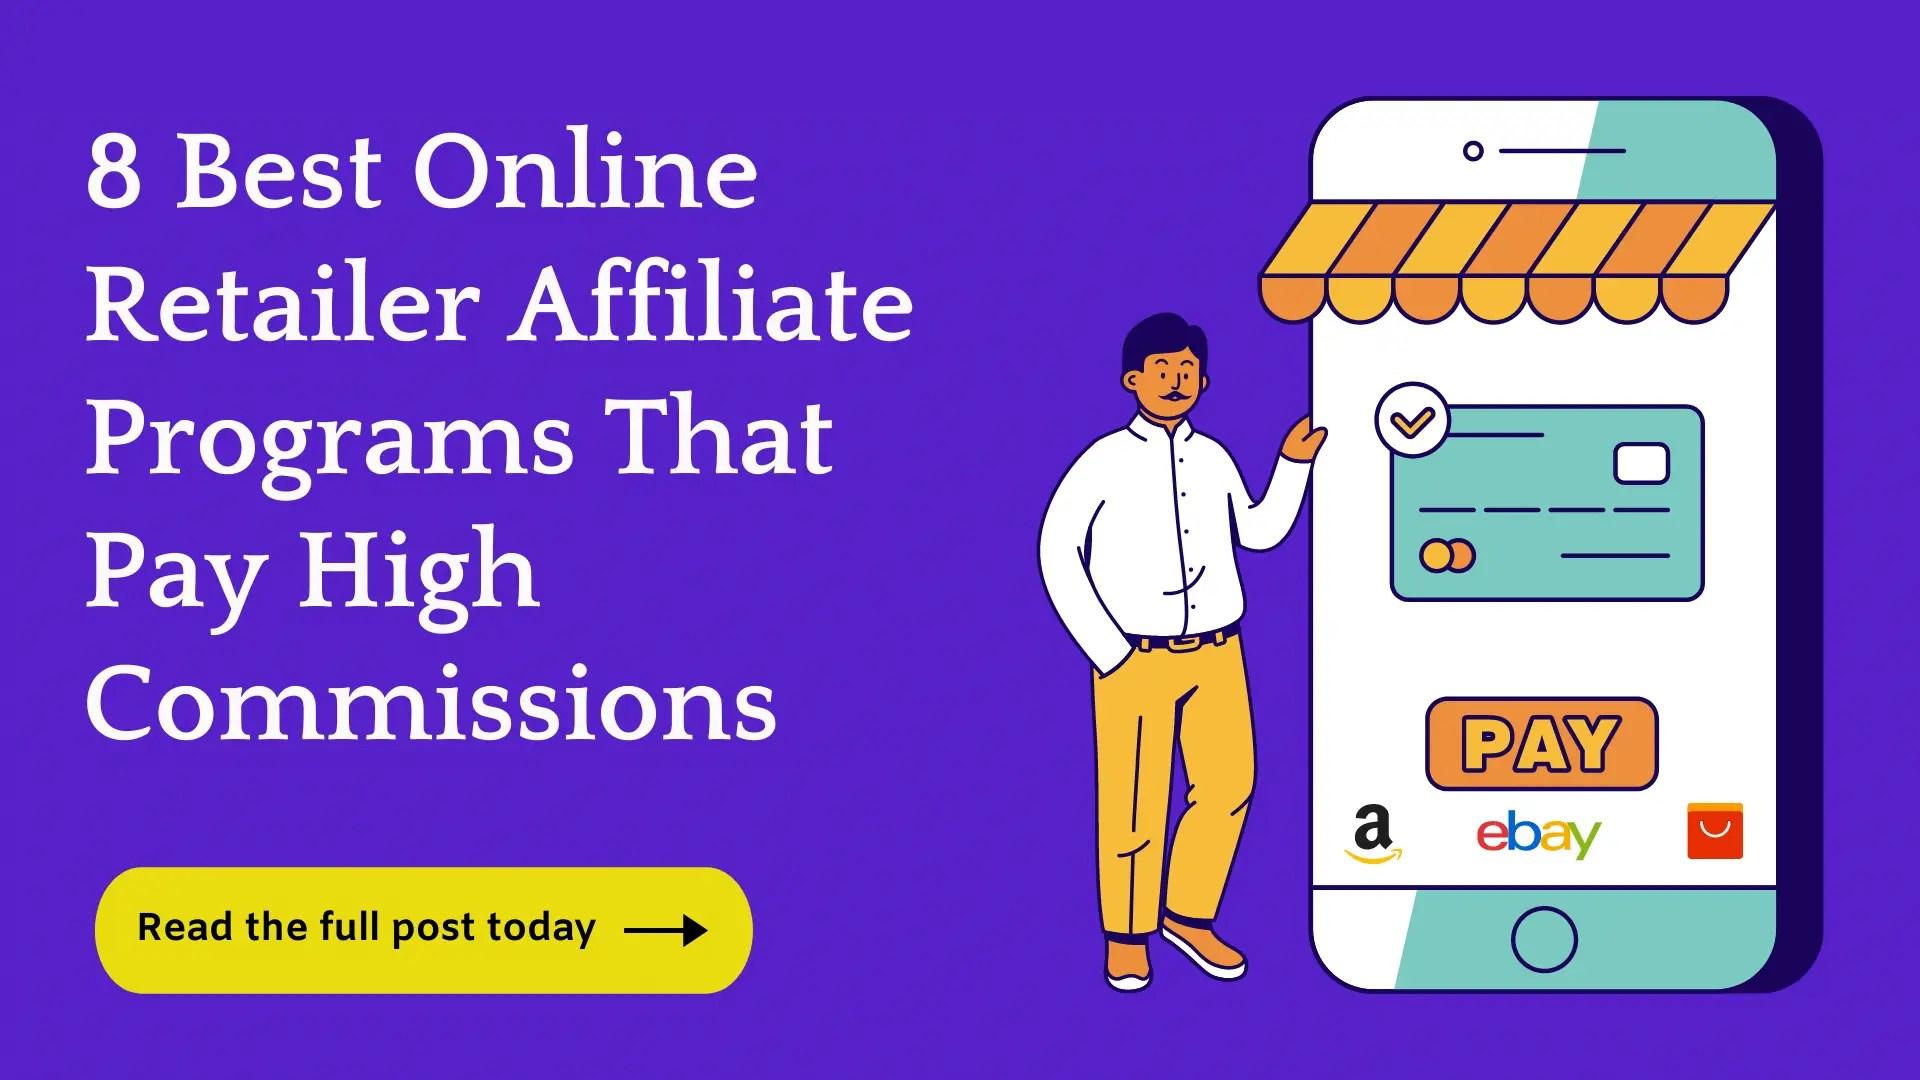 8 Best Online Retailer Affiliate Programs